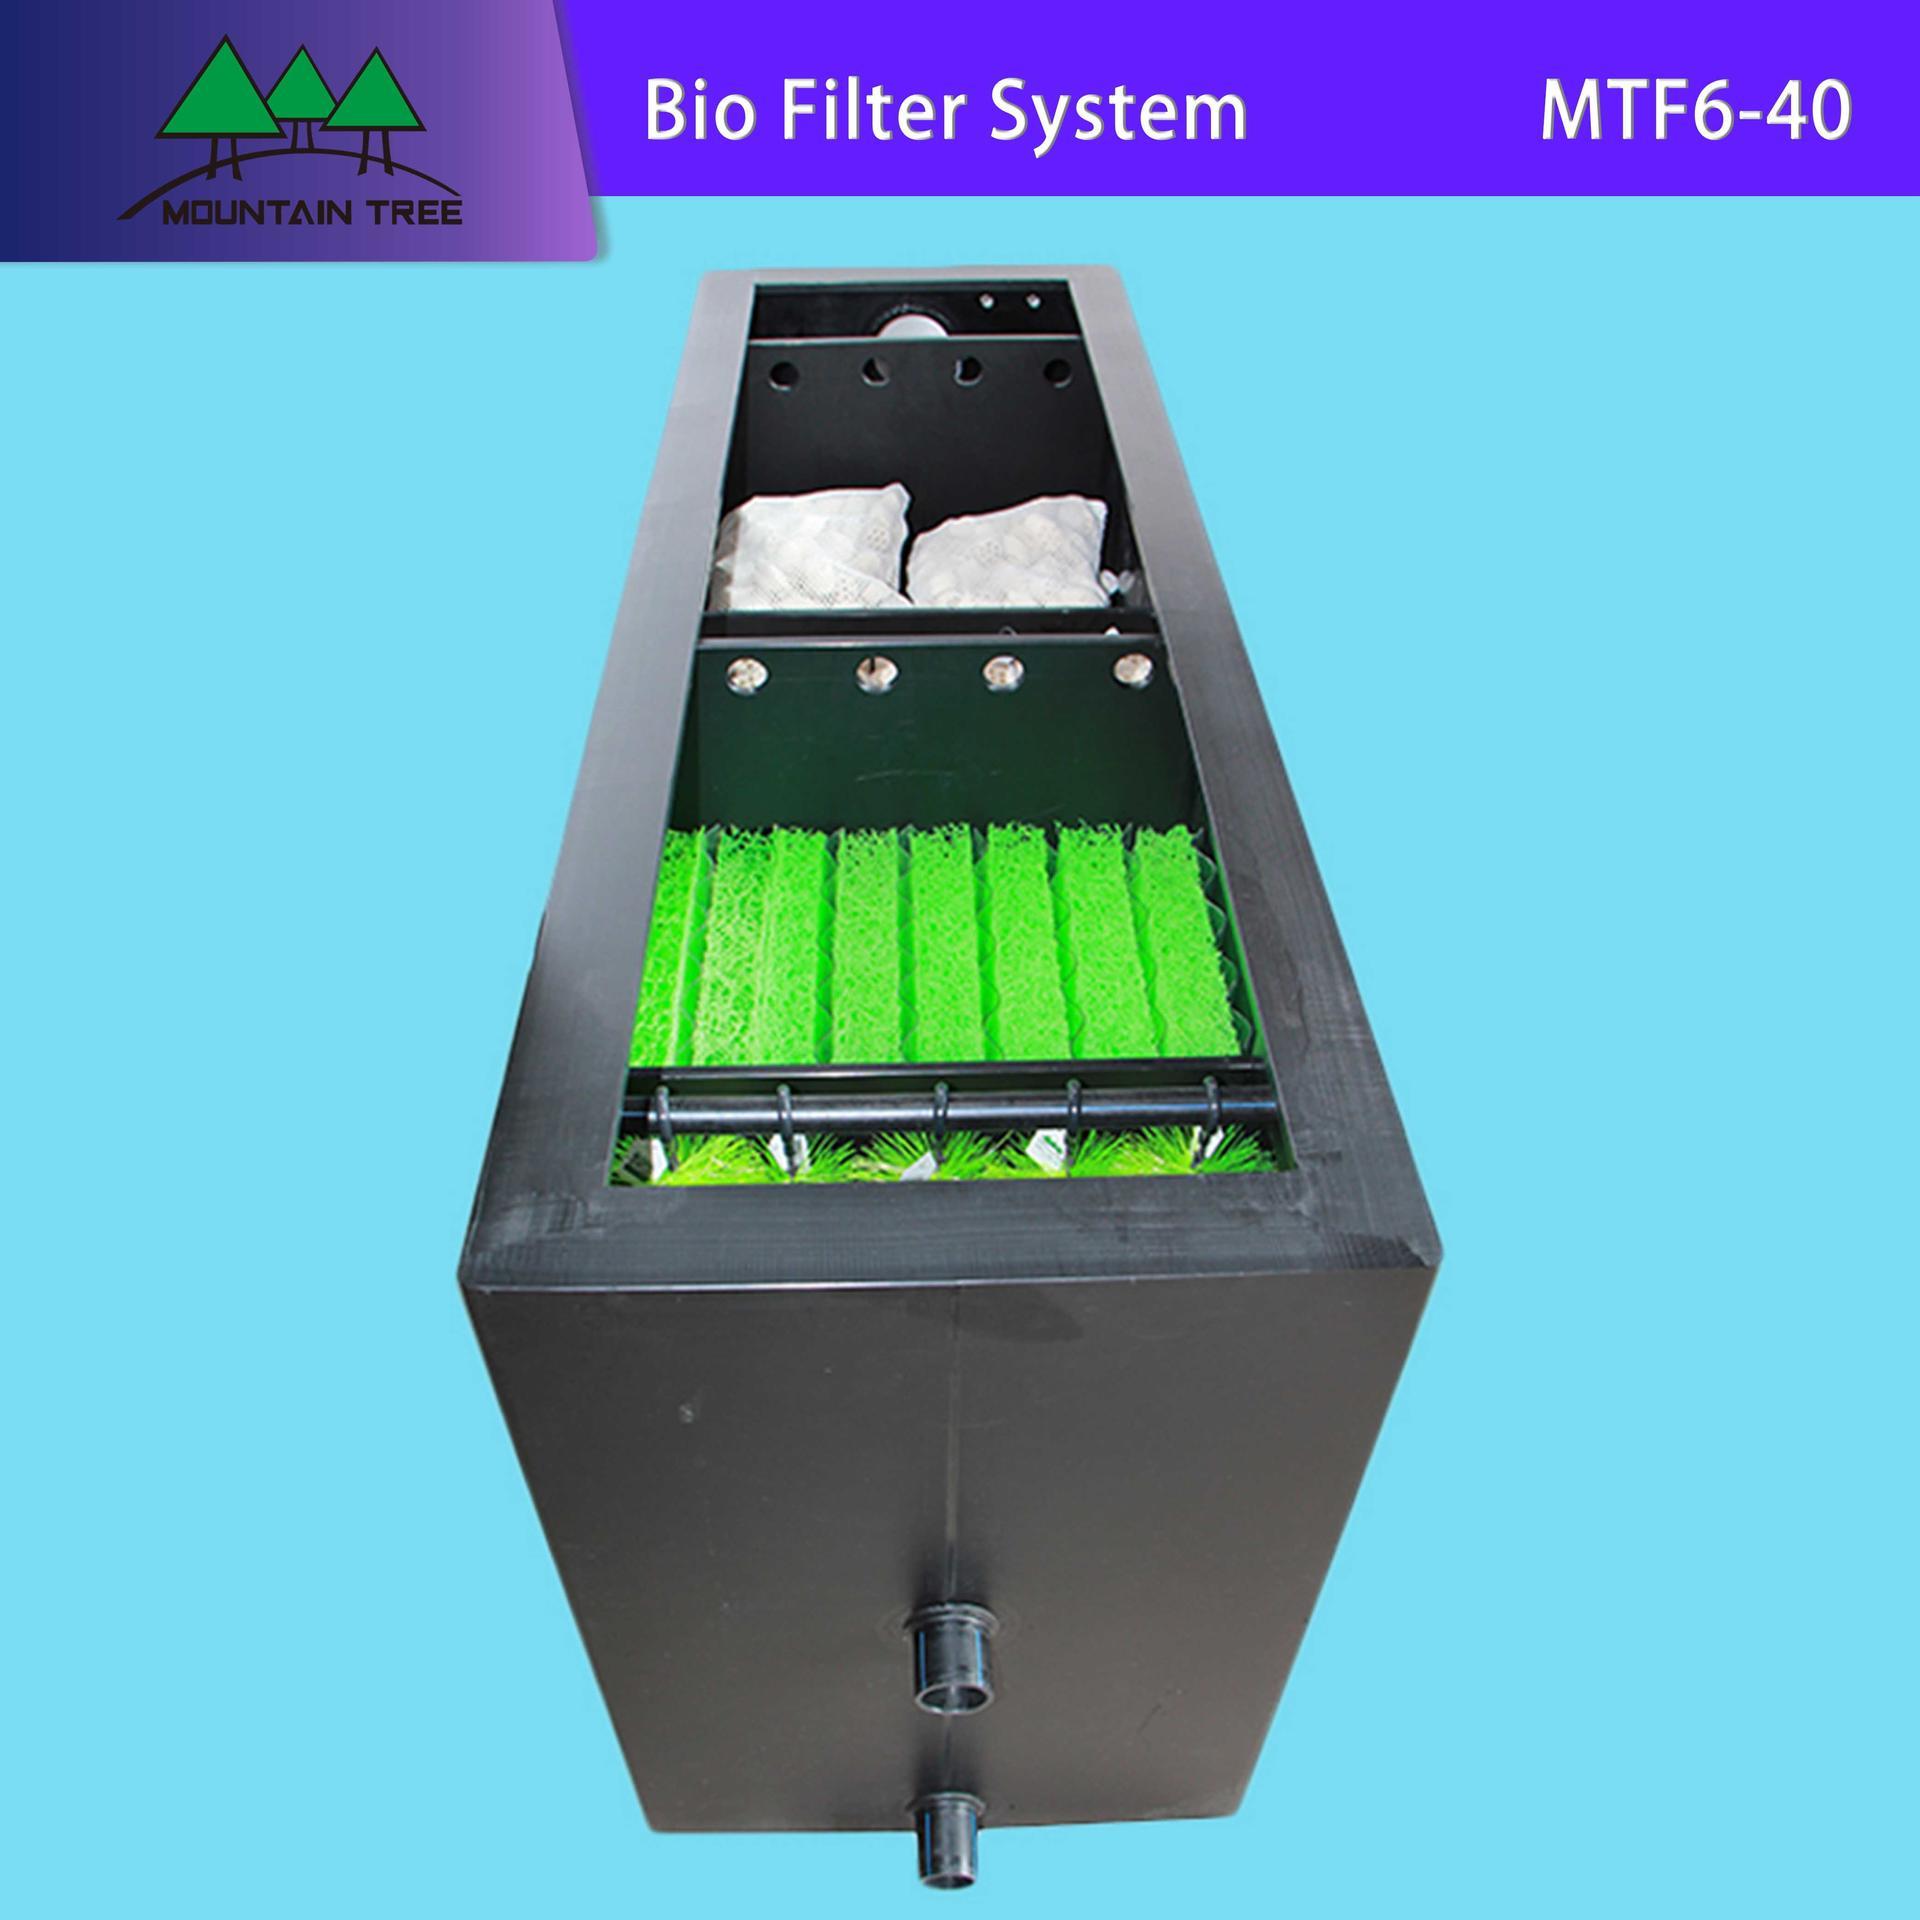 Uv Light Disinfection Bio Filter System MTF6-40